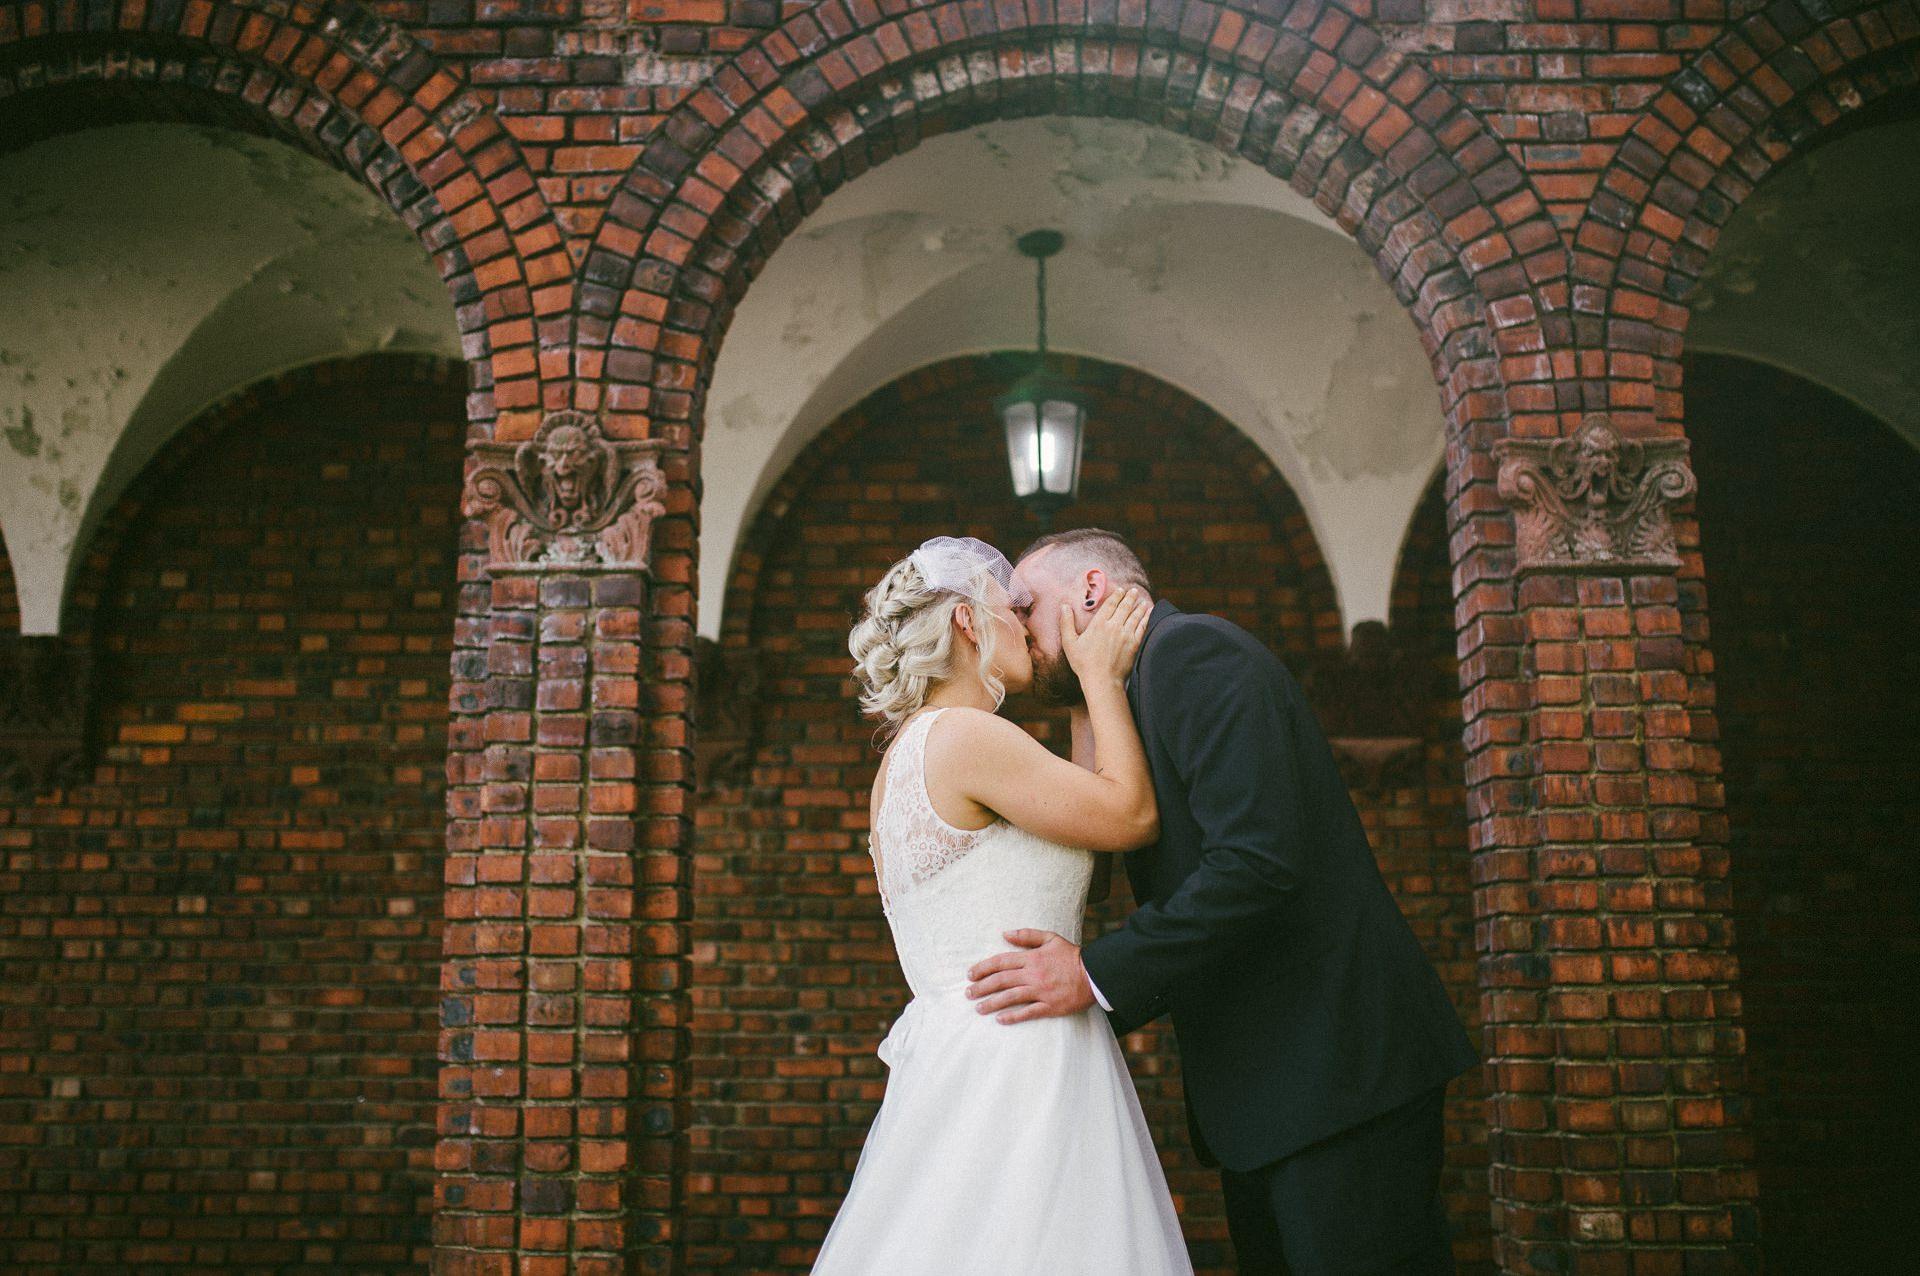 Goldhorn Brewery Wedding Photos in Cleveland 1 33.jpg